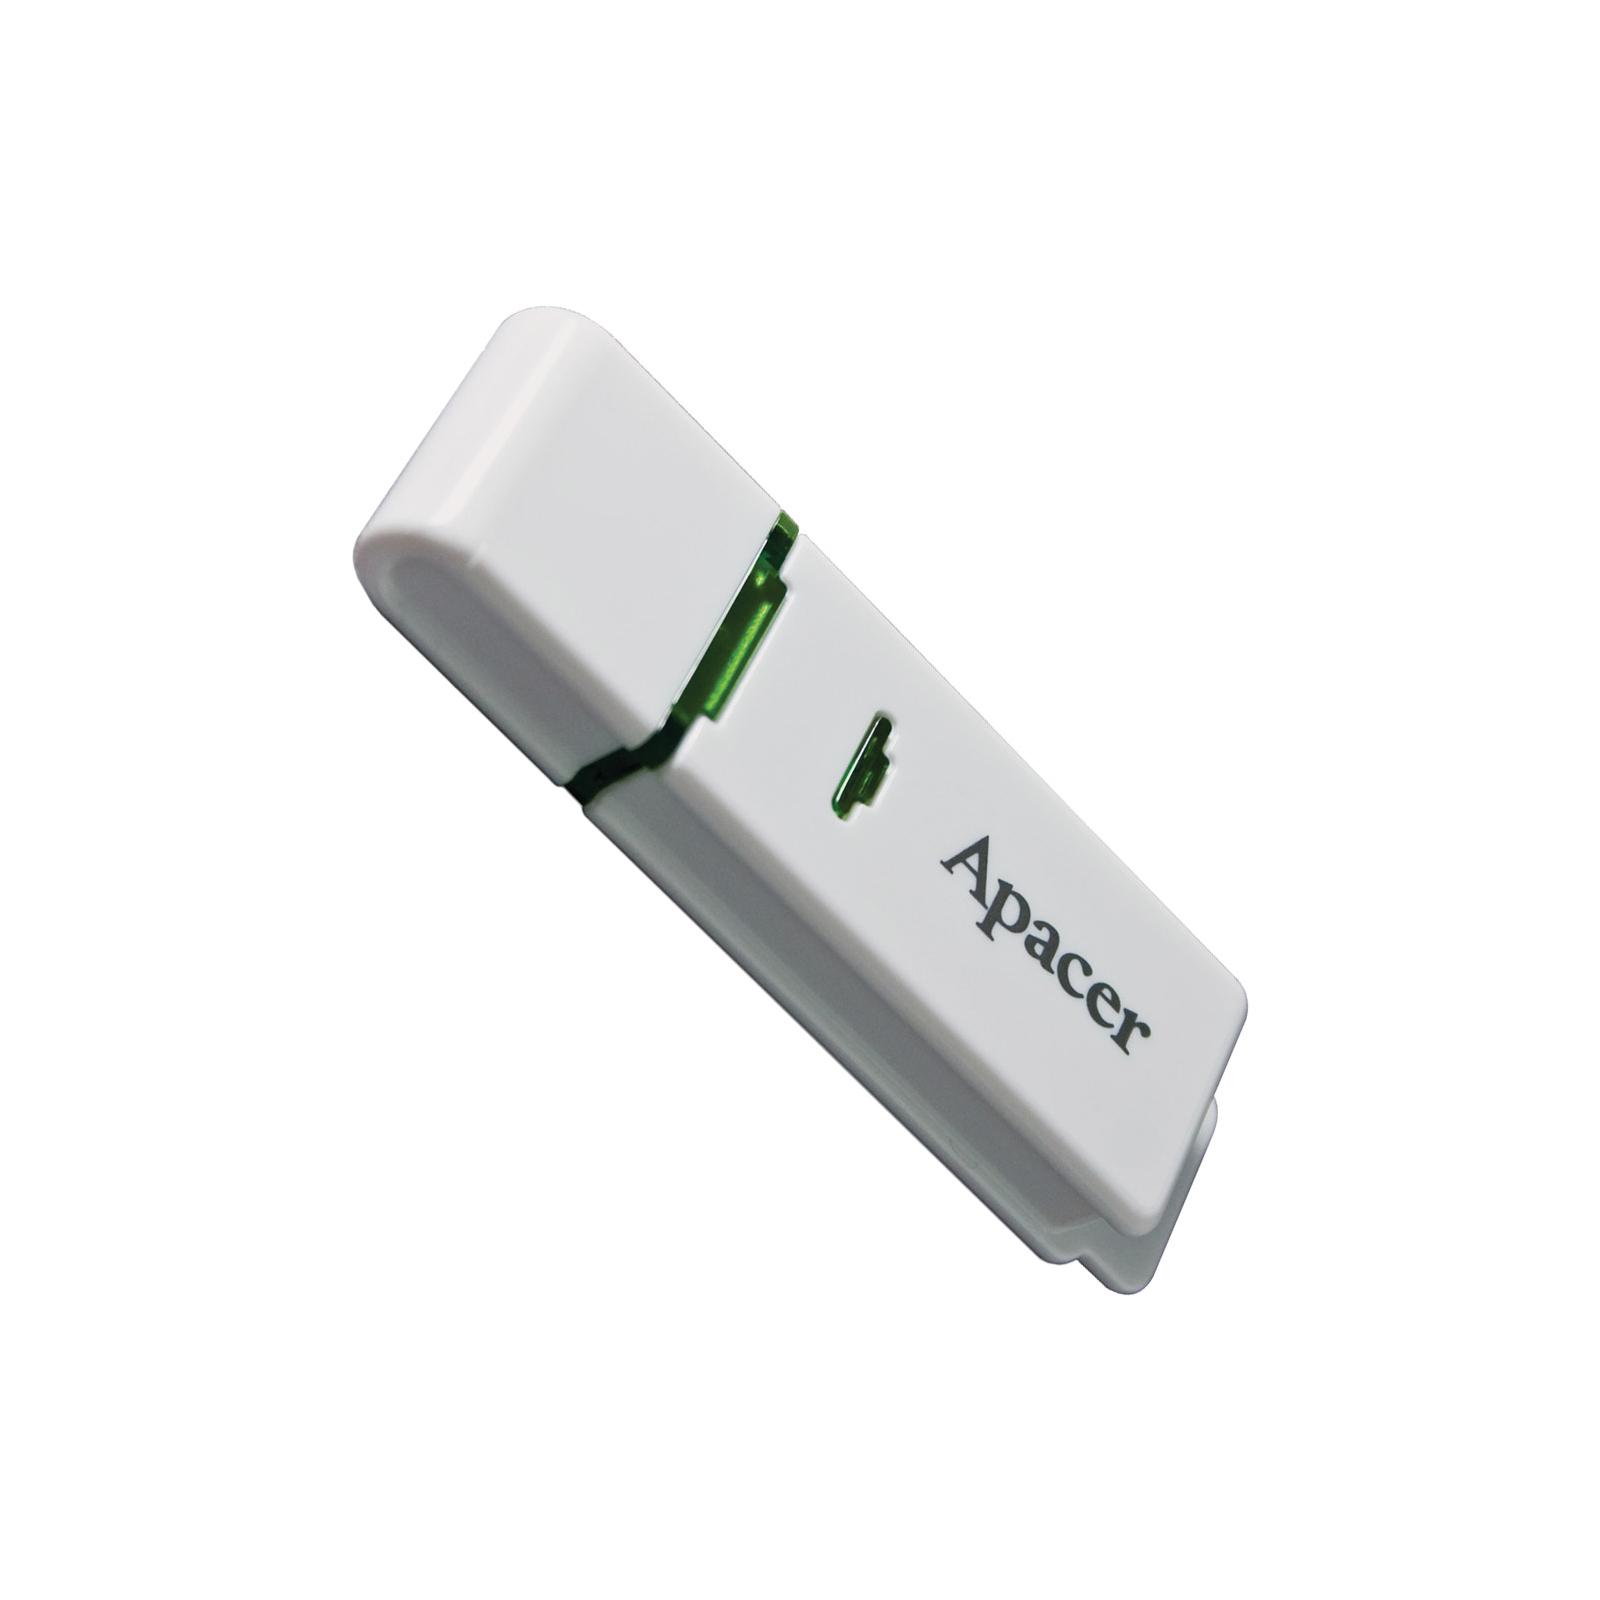 USB флеш накопитель Handy Steno AH223 white Apacer (AP16GAH223W-1) изображение 3